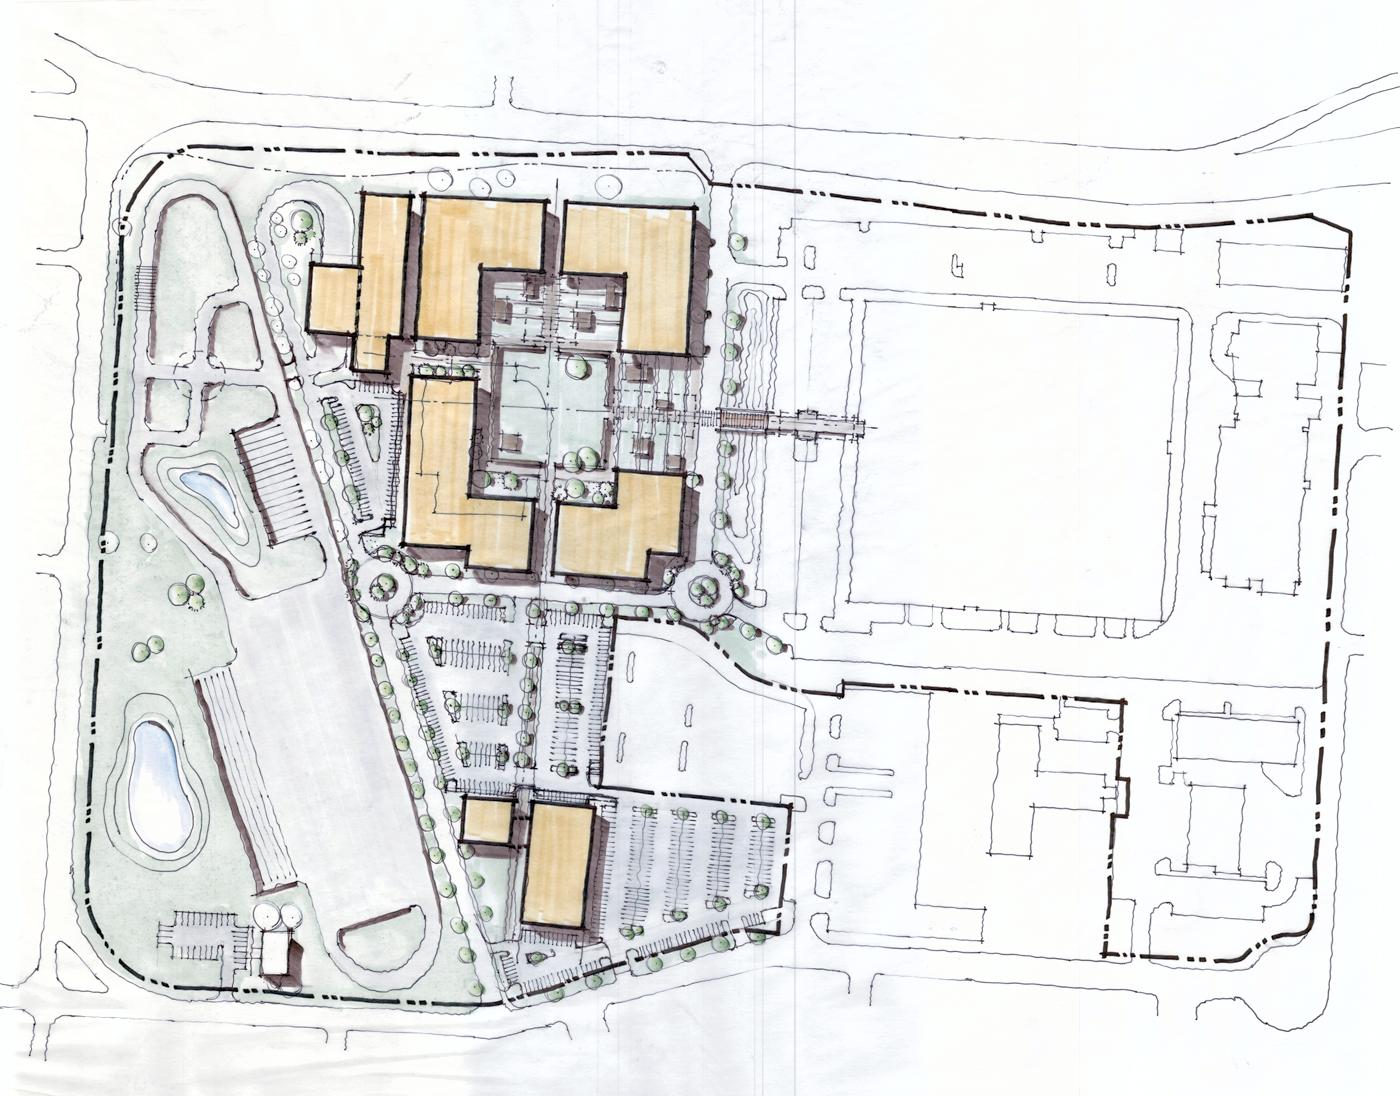 Featured Image: Alamo Colleges System, St. Phillip's Campus Master Plan